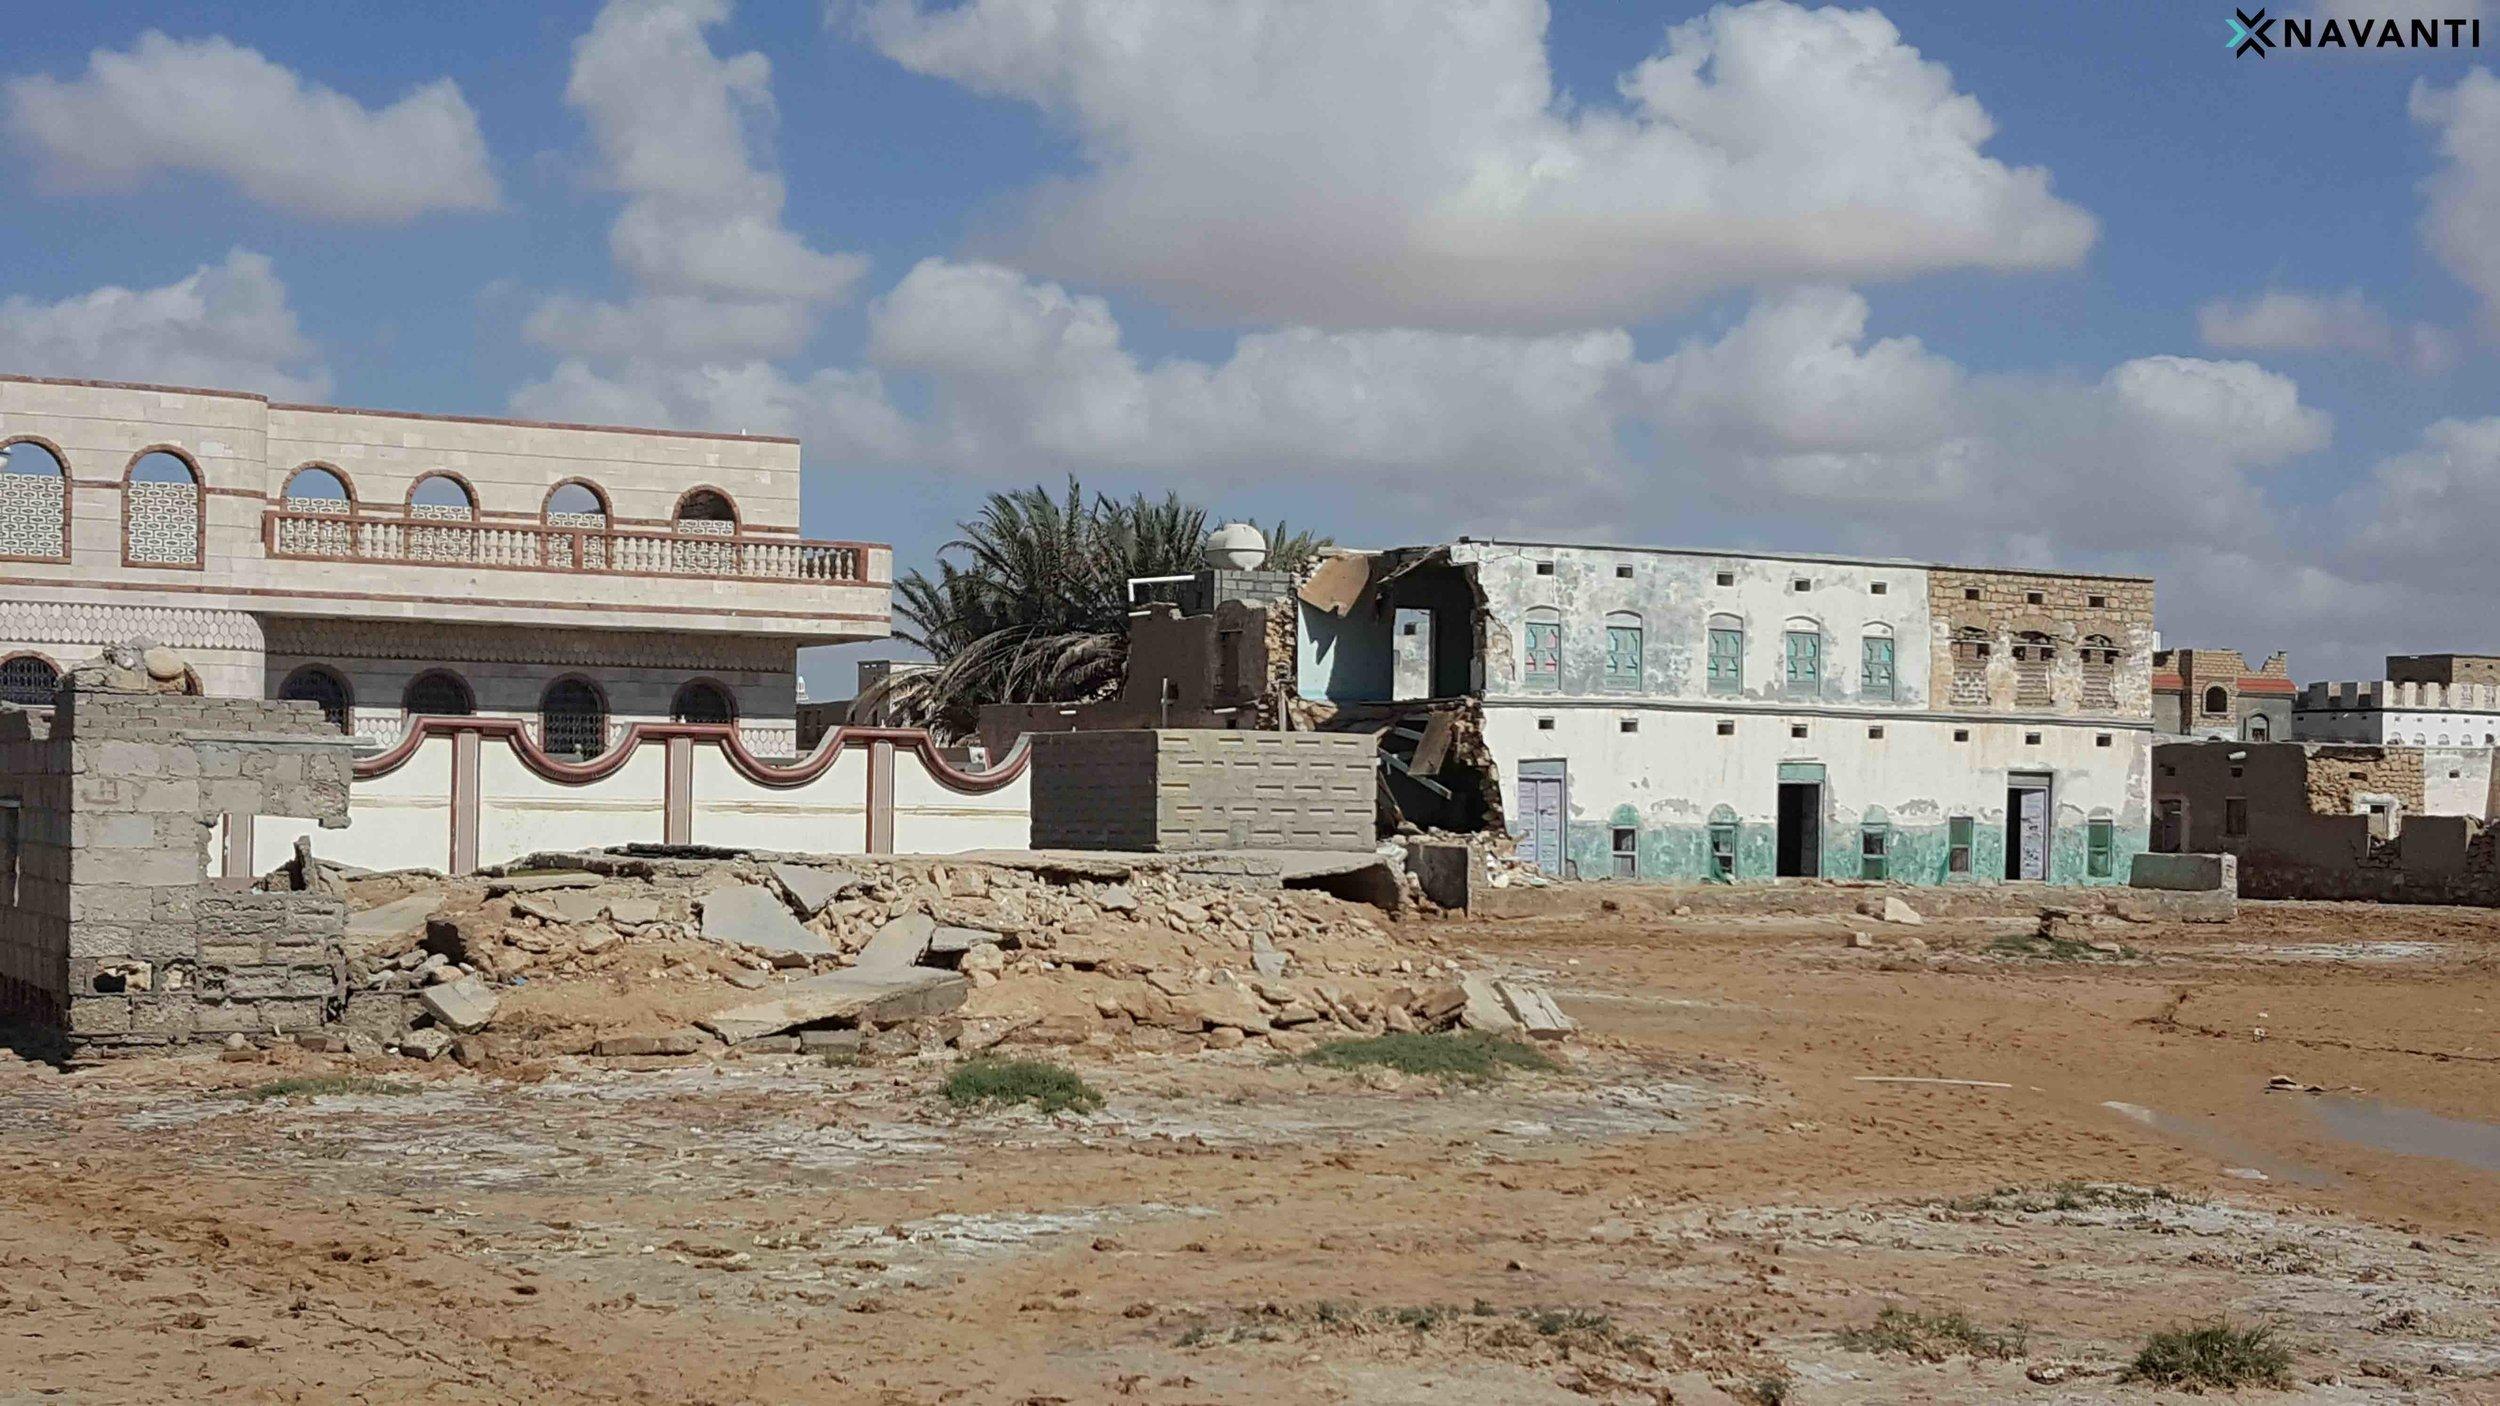 Houses in the town of Qishn, al-Mahra, damaged by Cyclone Luban. Source: Navanti